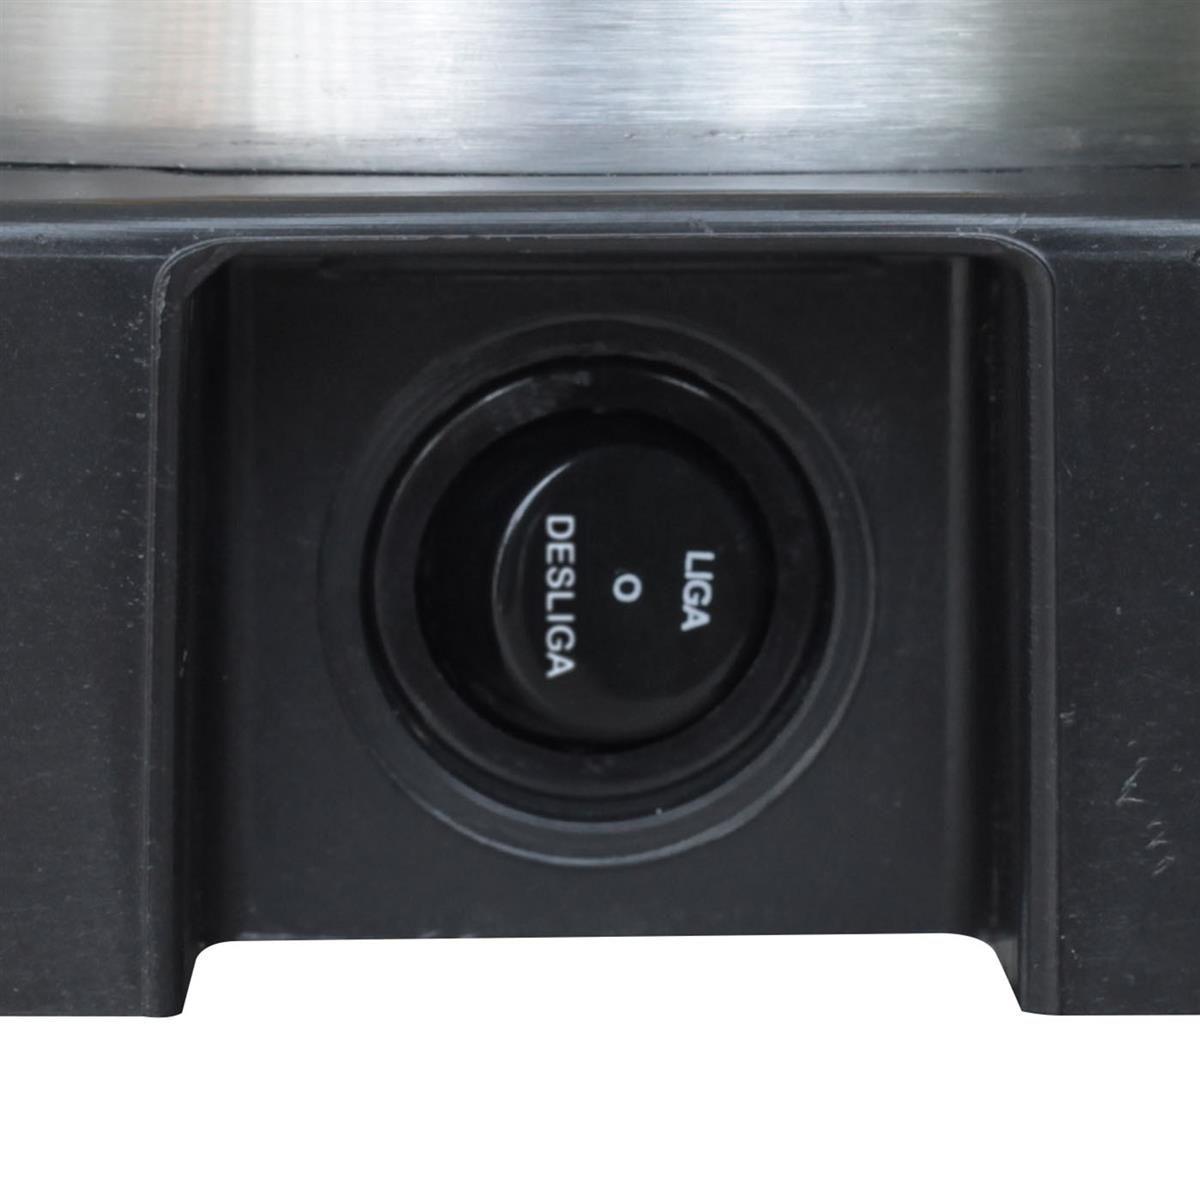 Espremedor de Frutas Médio 1/4 Cv - 180 W Bivolt - SPL-005 - Spolu